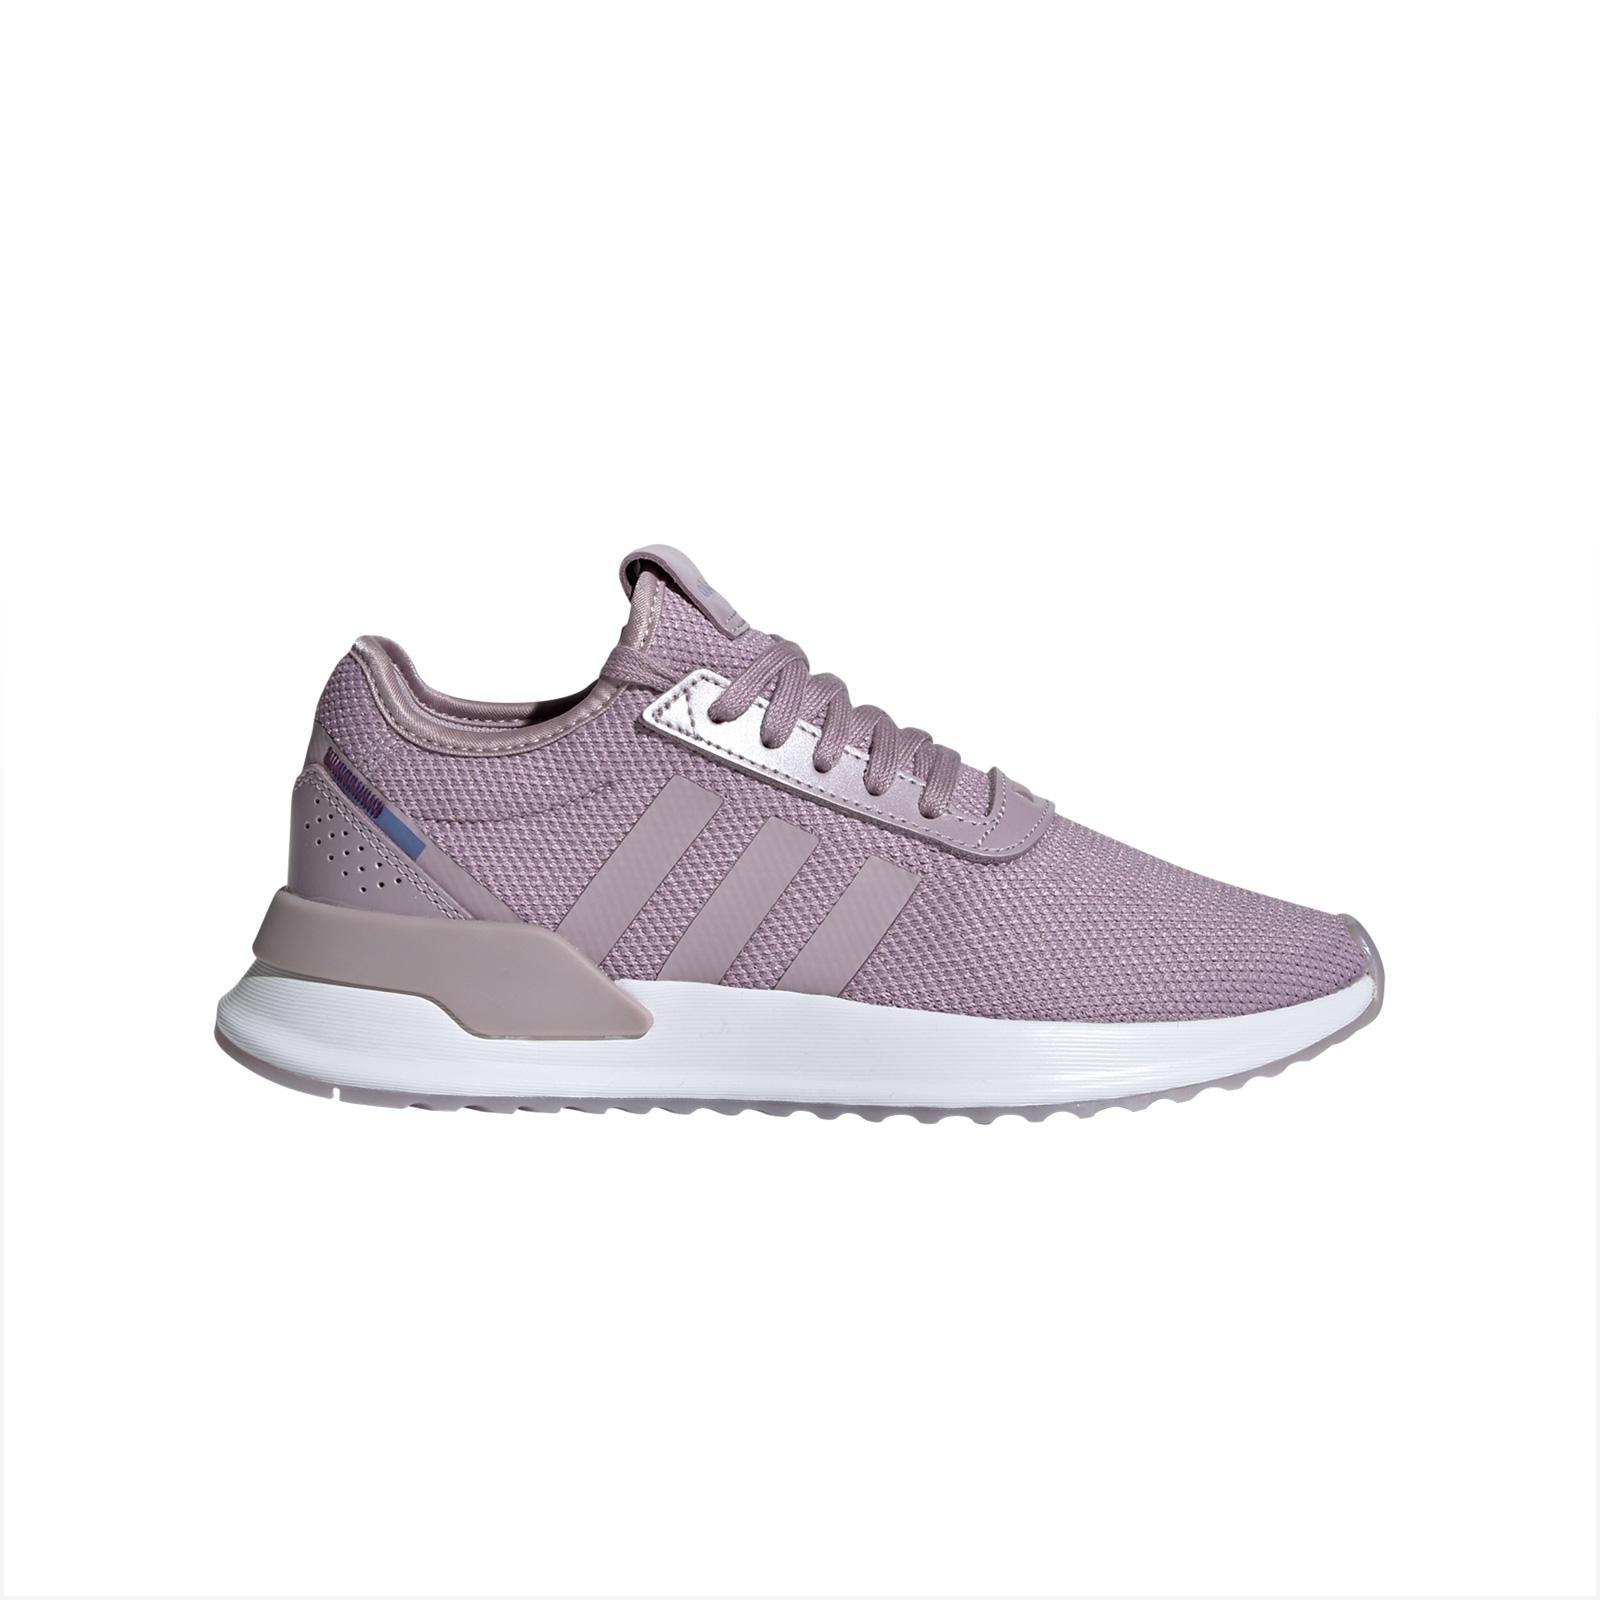 adidas Originals - U_PATH X W - SOFVIS/CHAPUR/FTWWHT